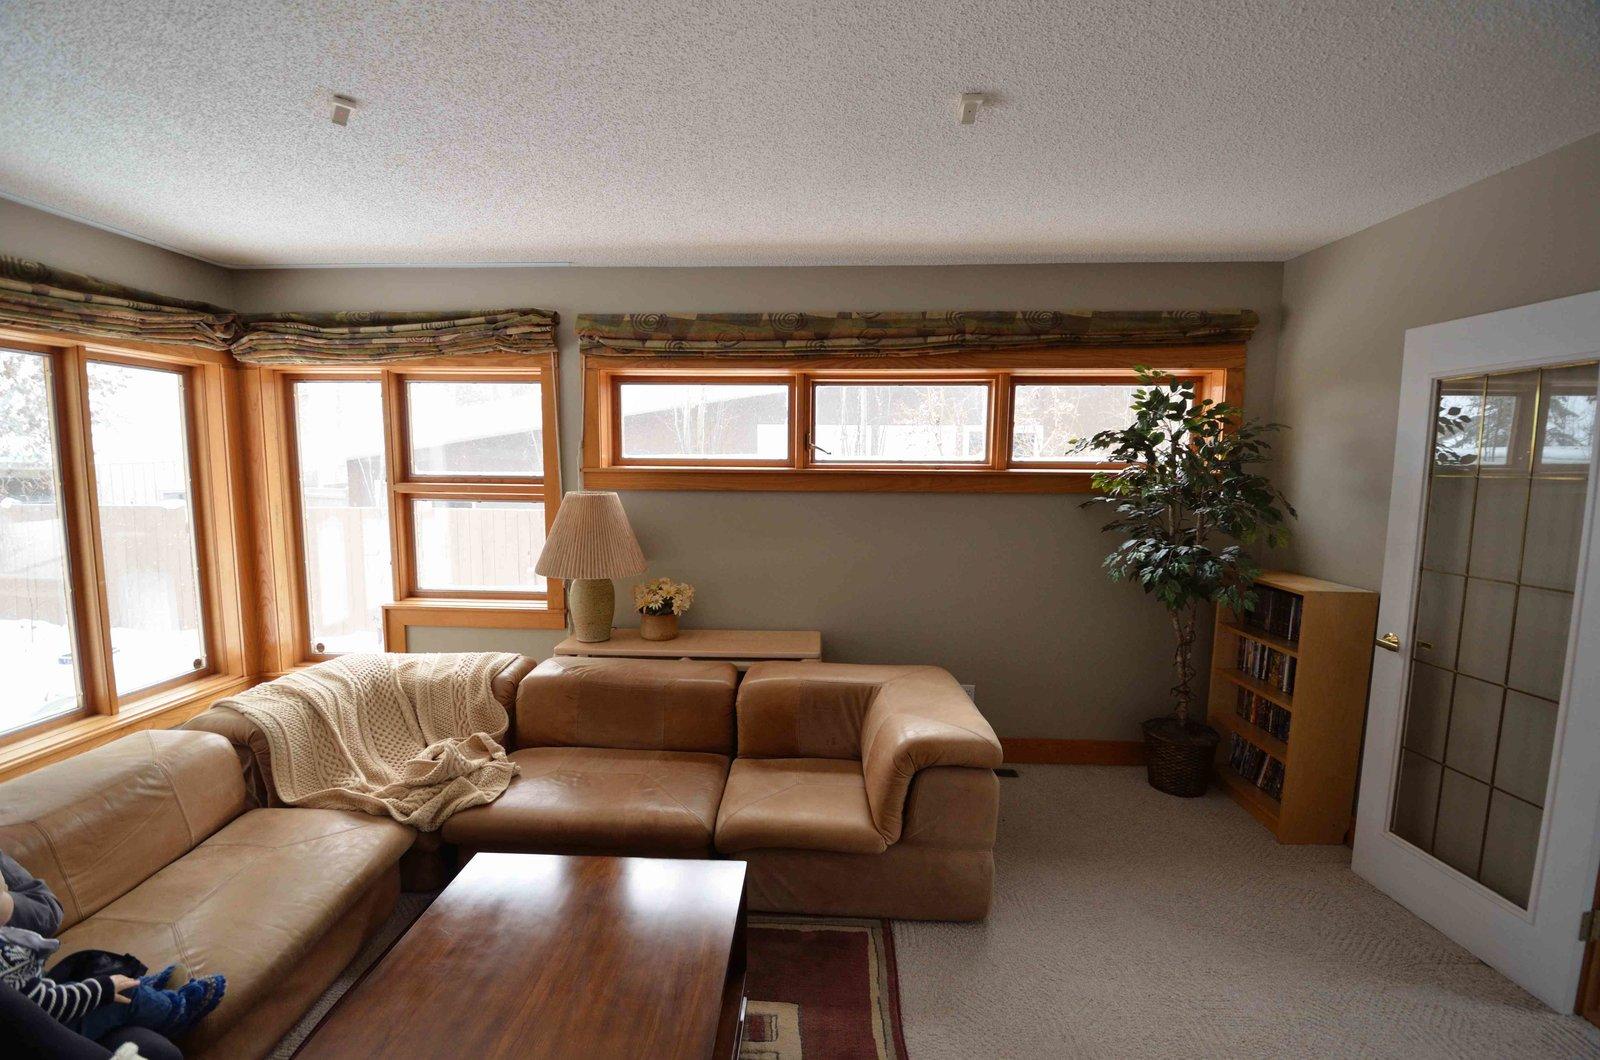 Living Room - Before Re-Model  Crestwood Re-Model by Mindy Gudzinski Design